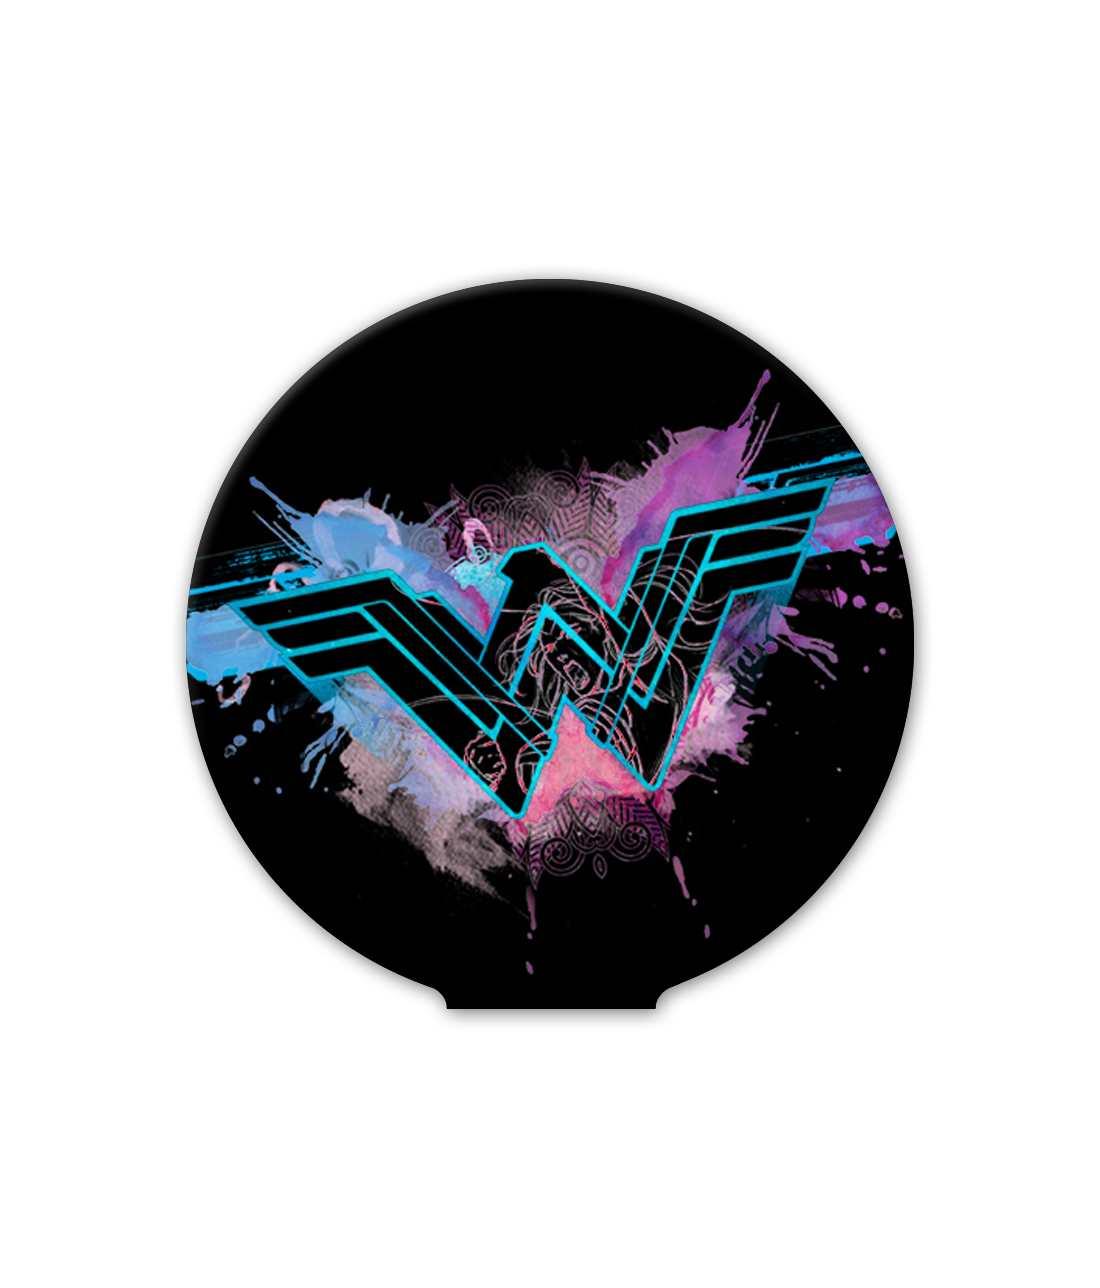 Wonder Woman Splash - Macmerise Sticky Pad